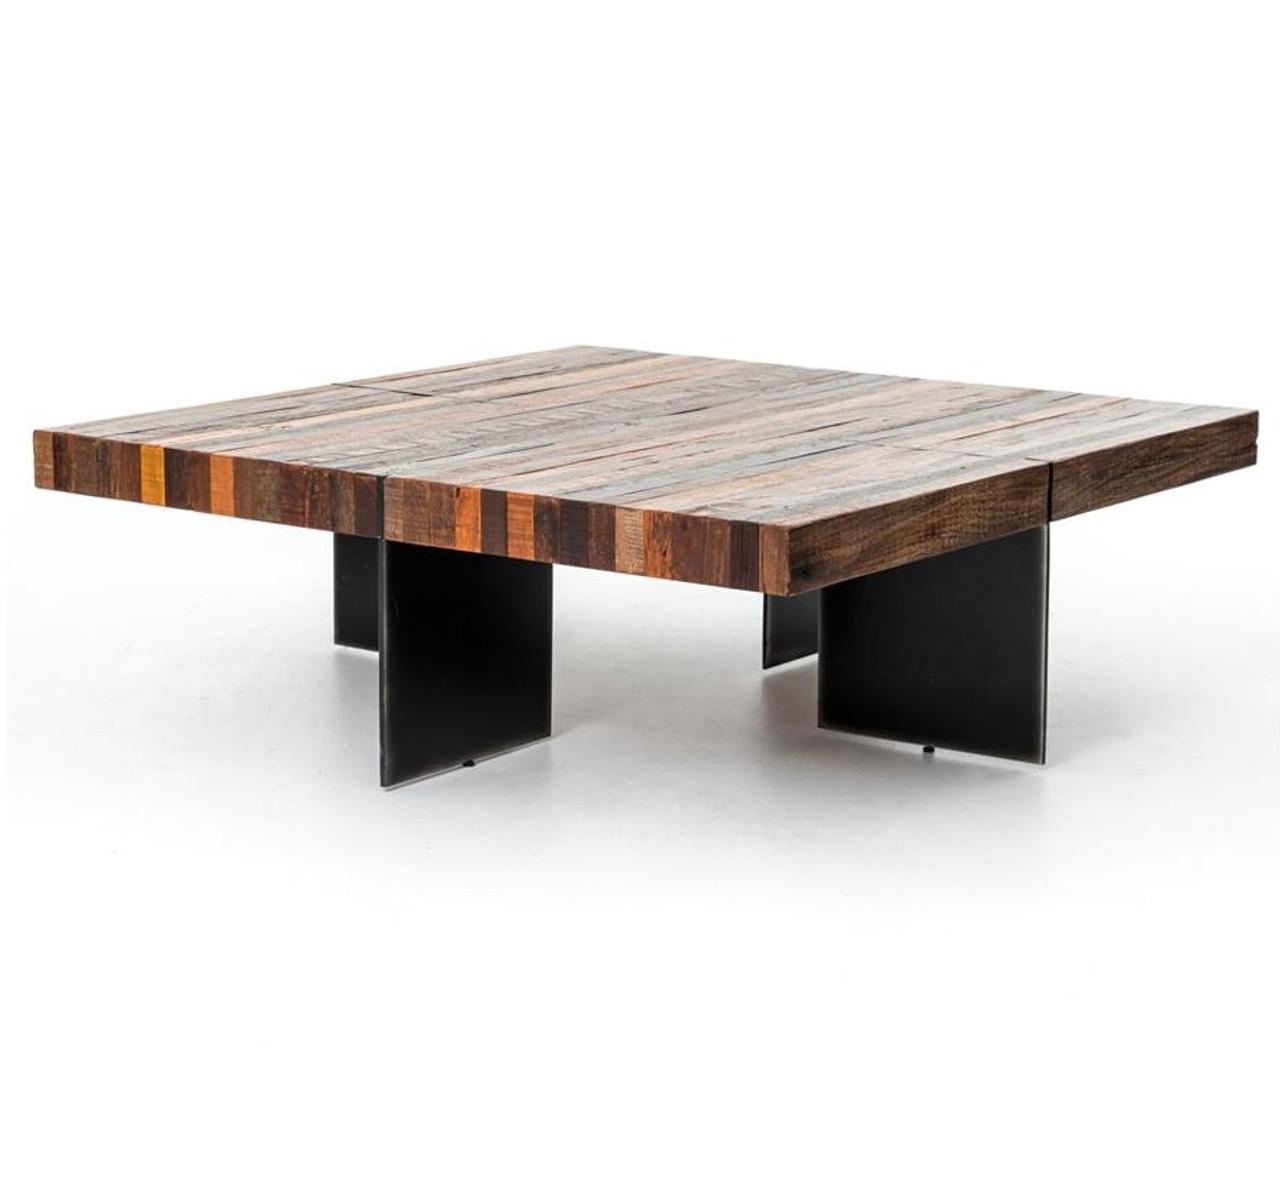 Alec Industrial U0026 Rustic Square Coffee Table